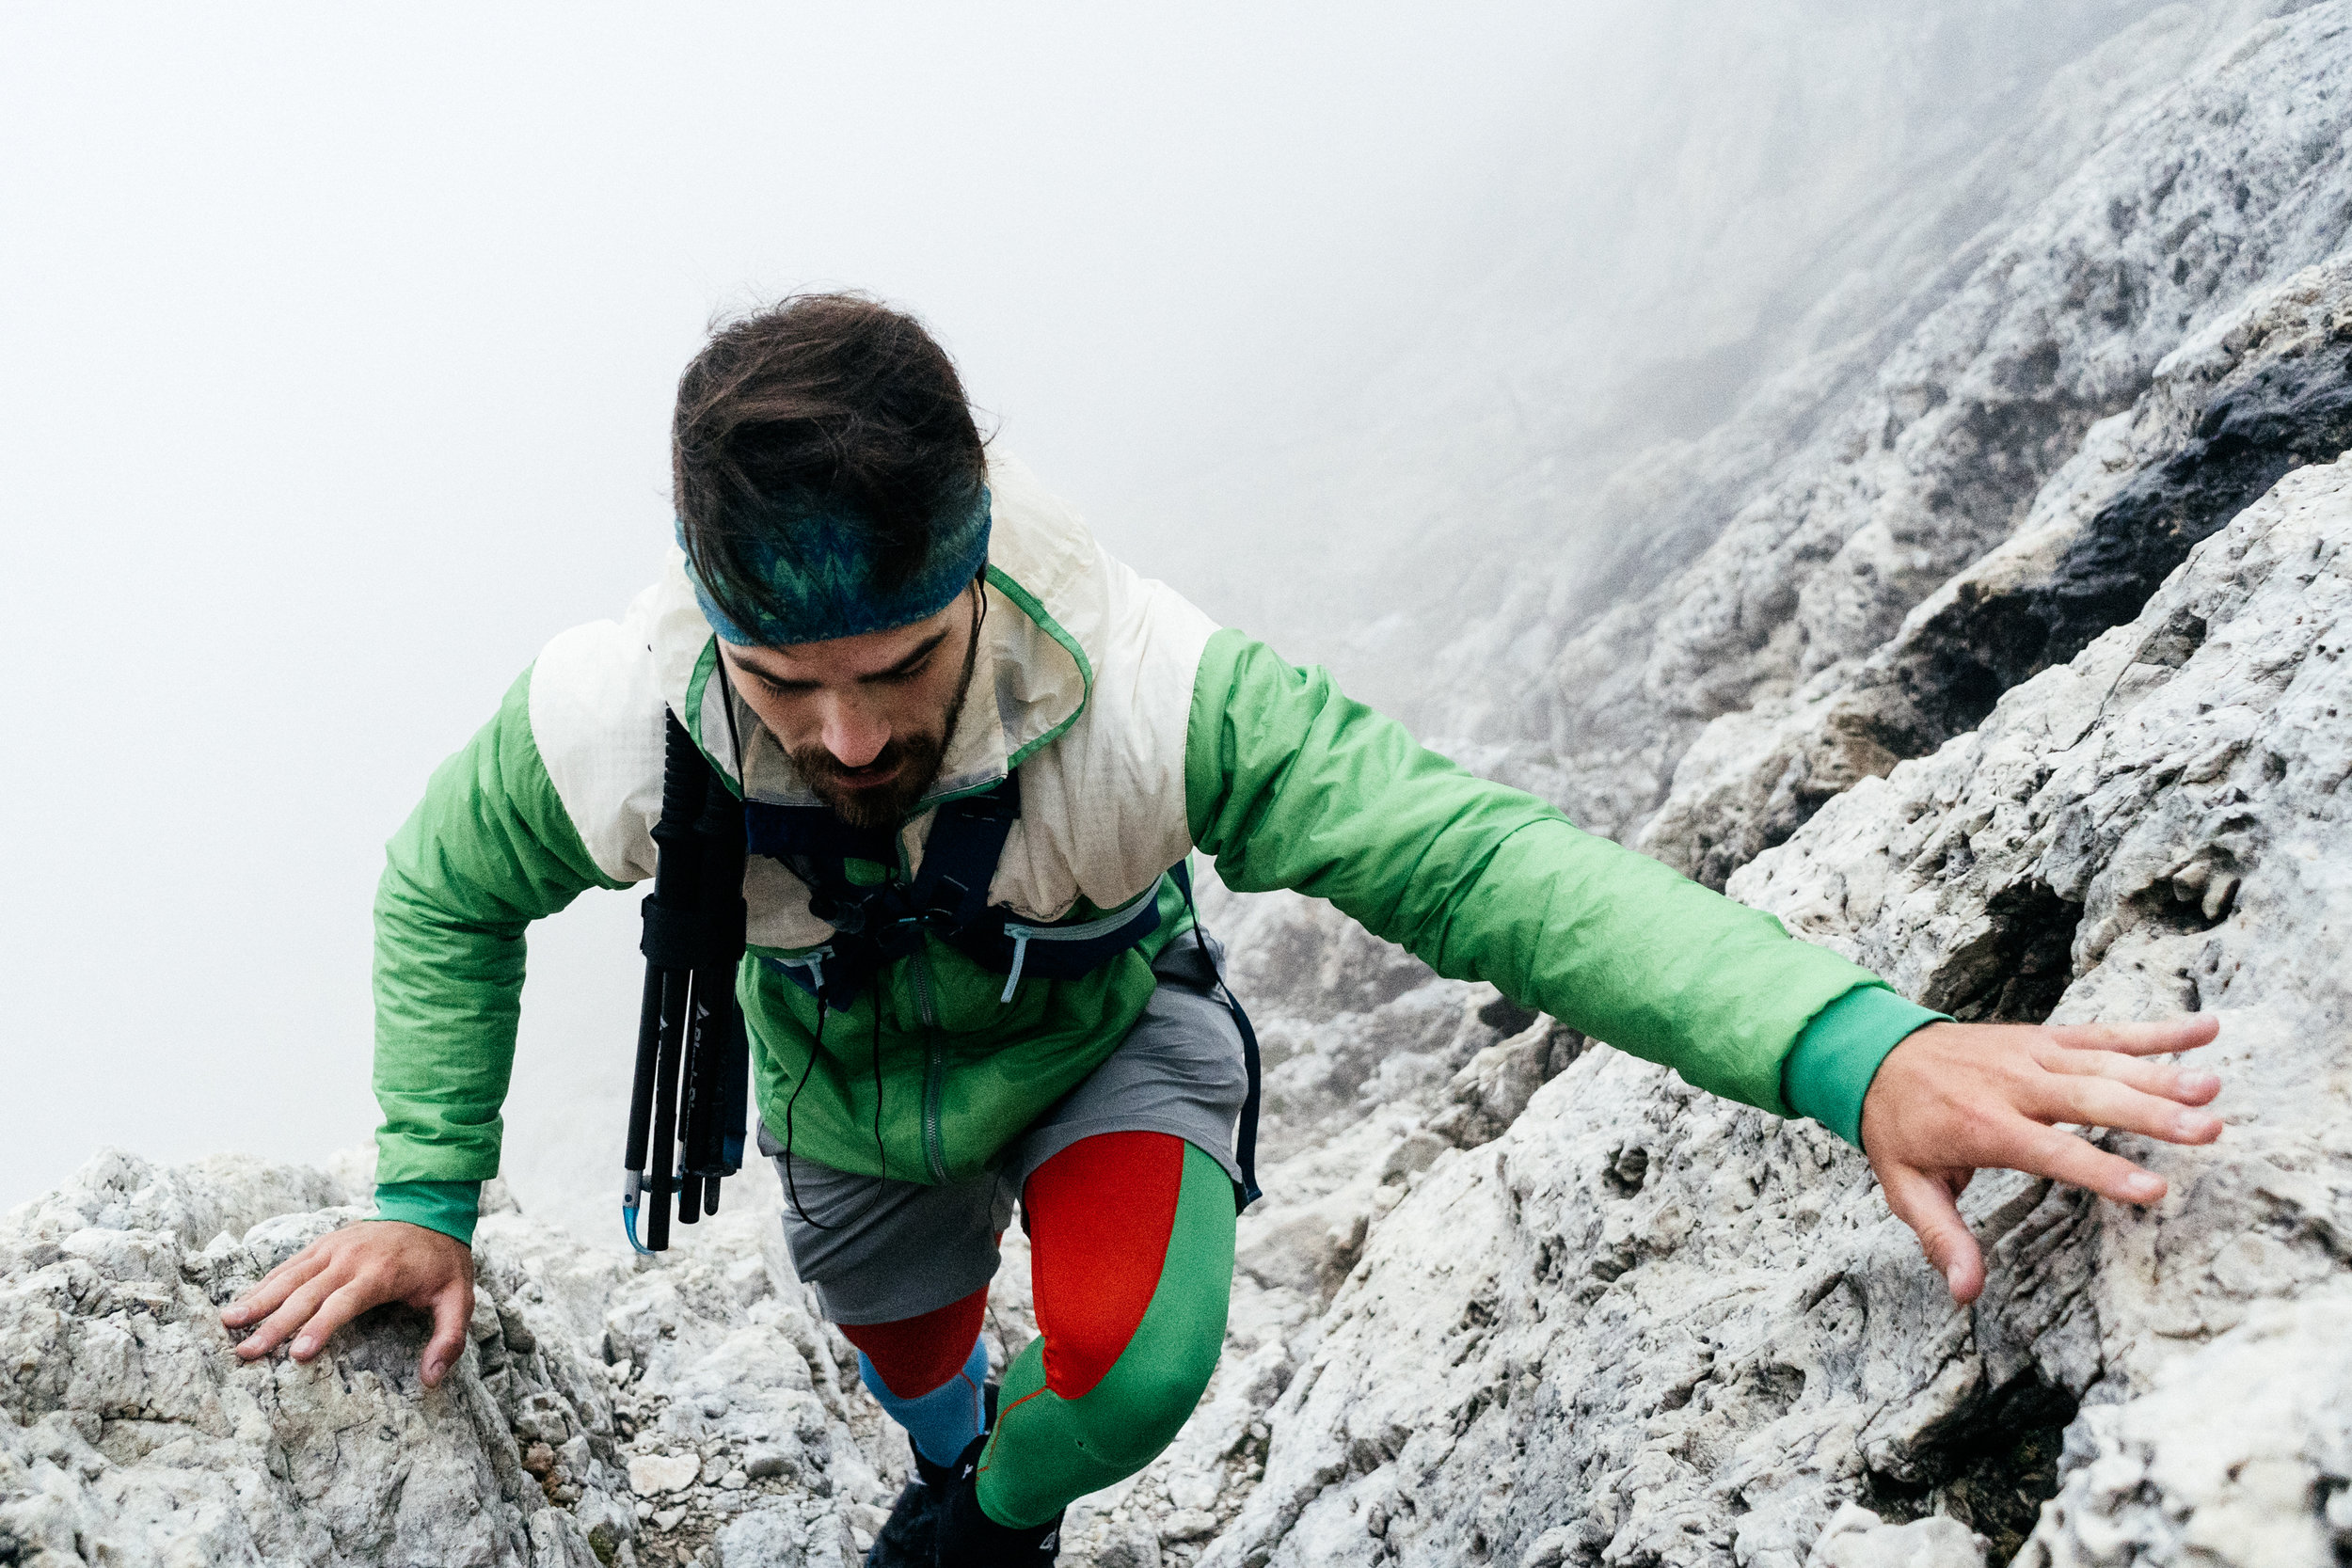 Dolomites-ChrisBrinleeJr-SEP17-69.jpg